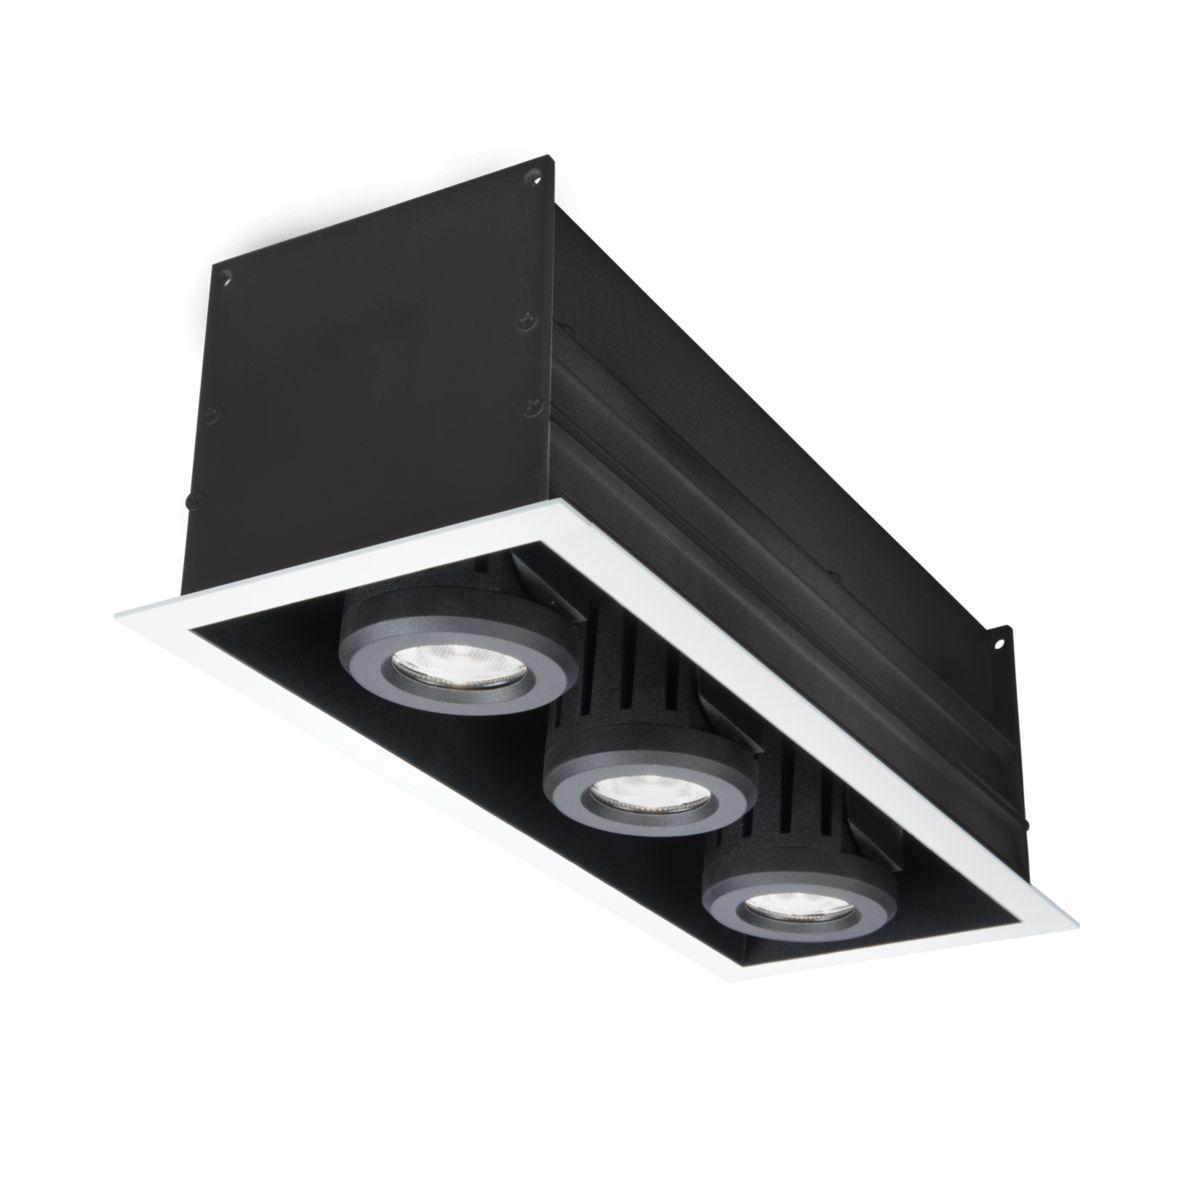 MRZ-3 Multi-Head Recessed Integral LED